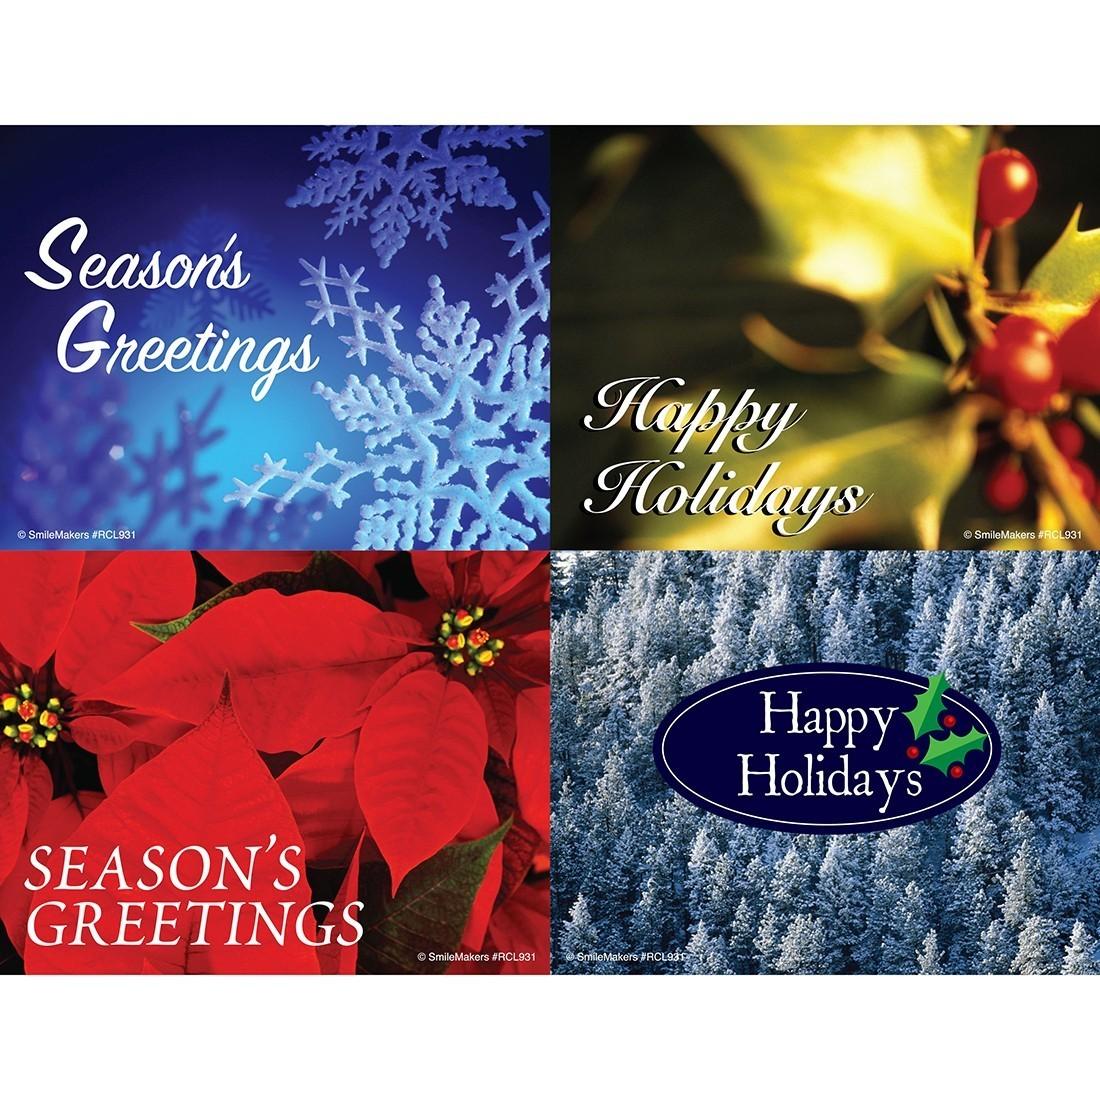 Season's Greetings Laser Cards [image]